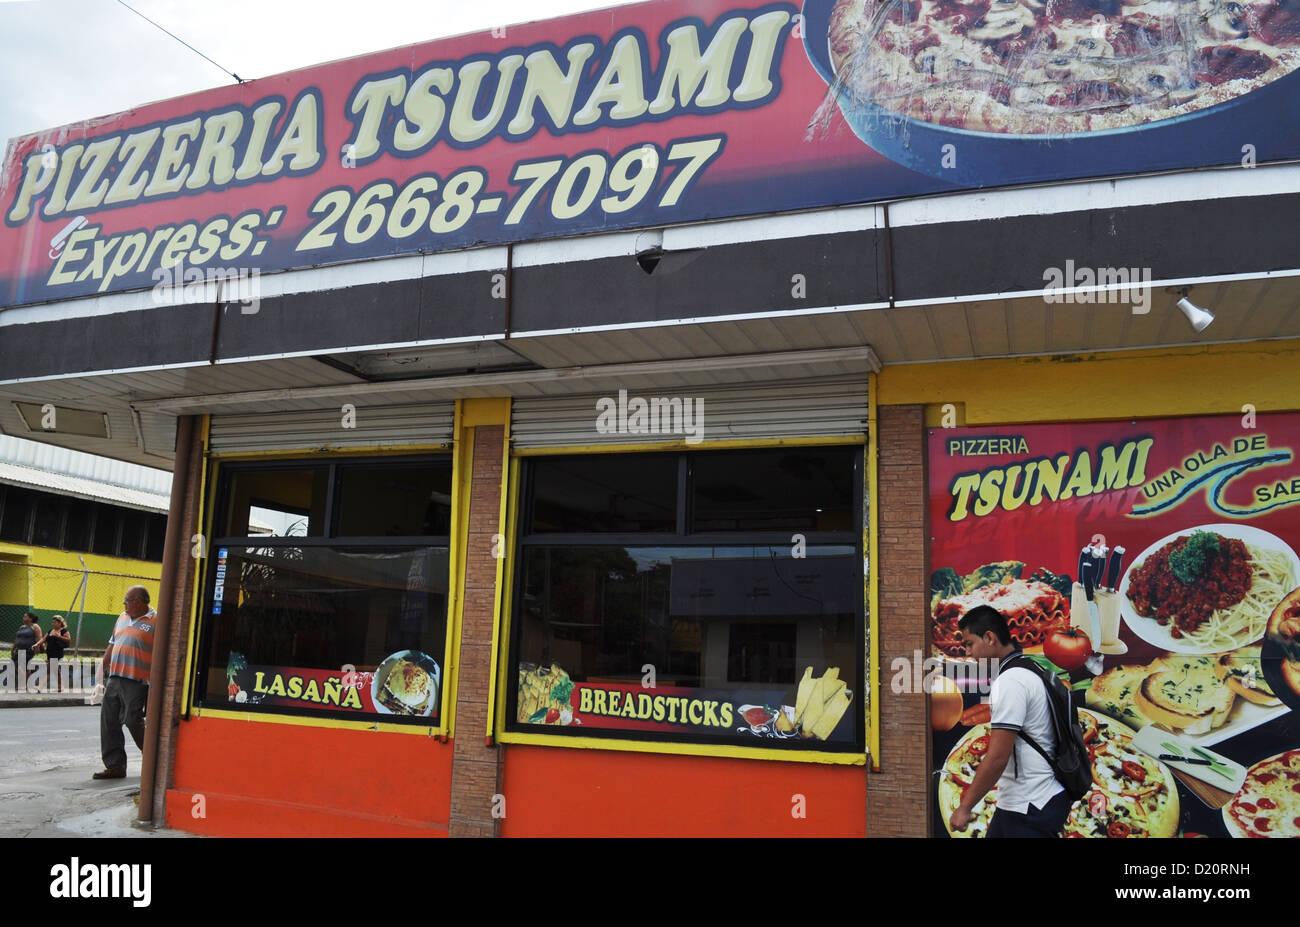 business plan tsunami pizza - pizza business plan outline.